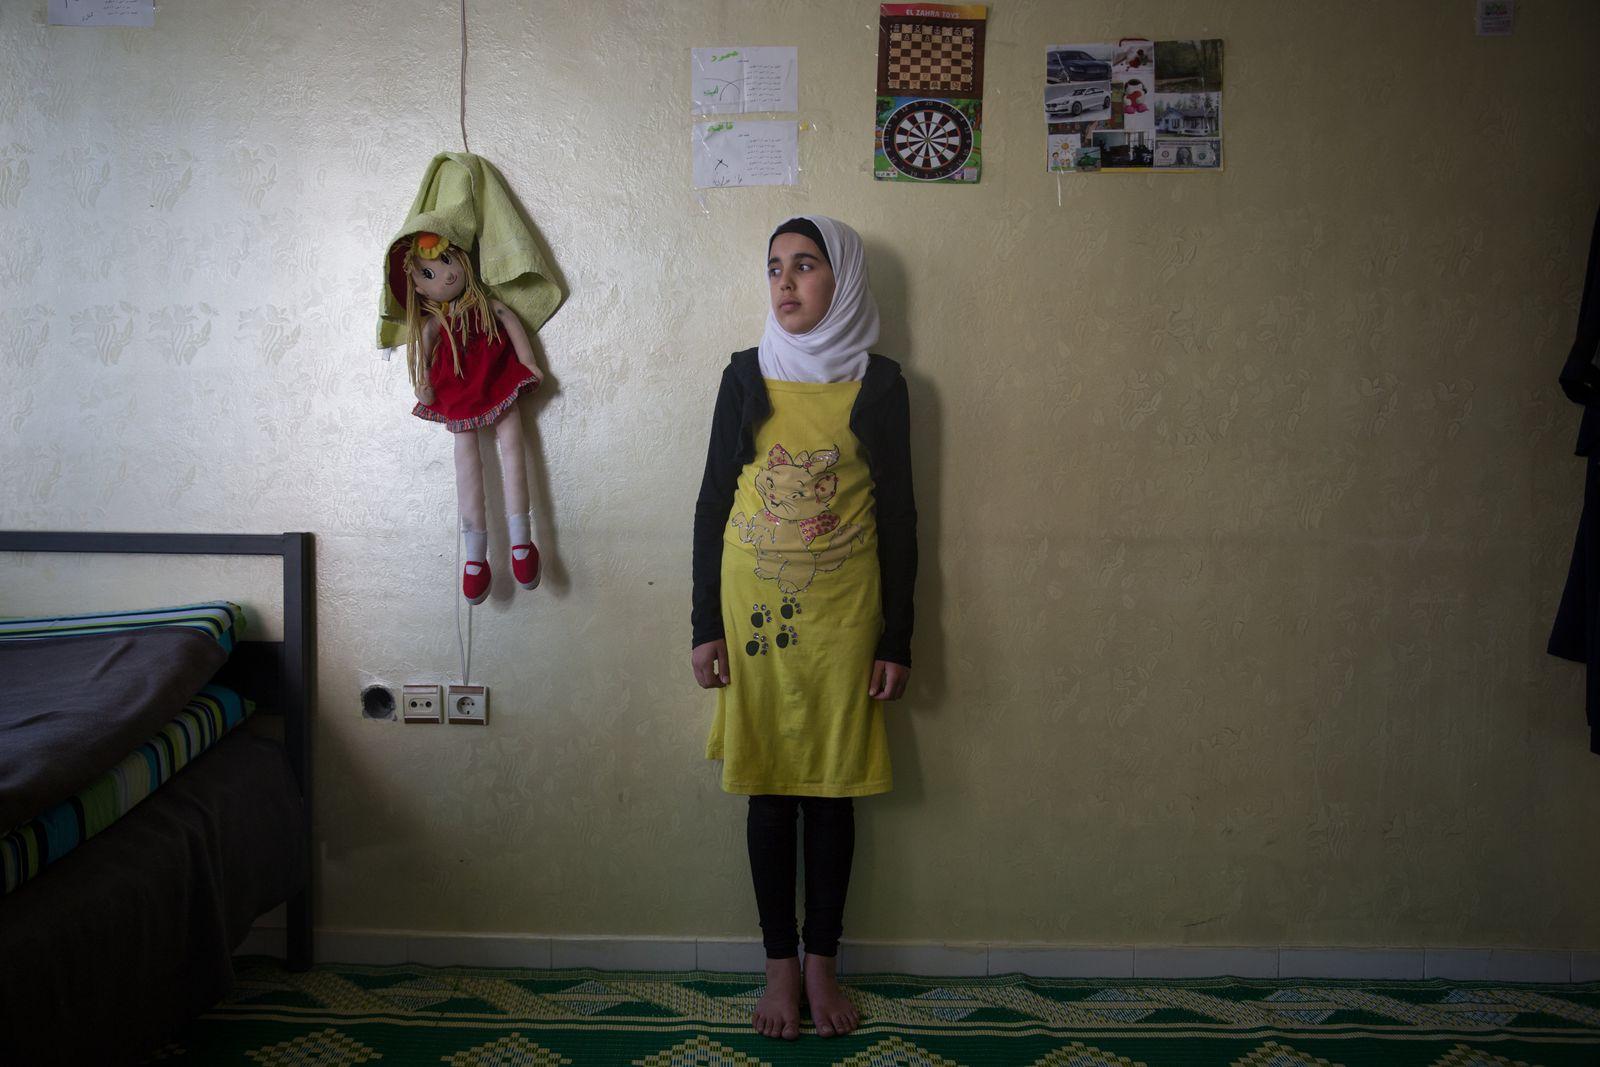 Syrien/Flüchtlinge